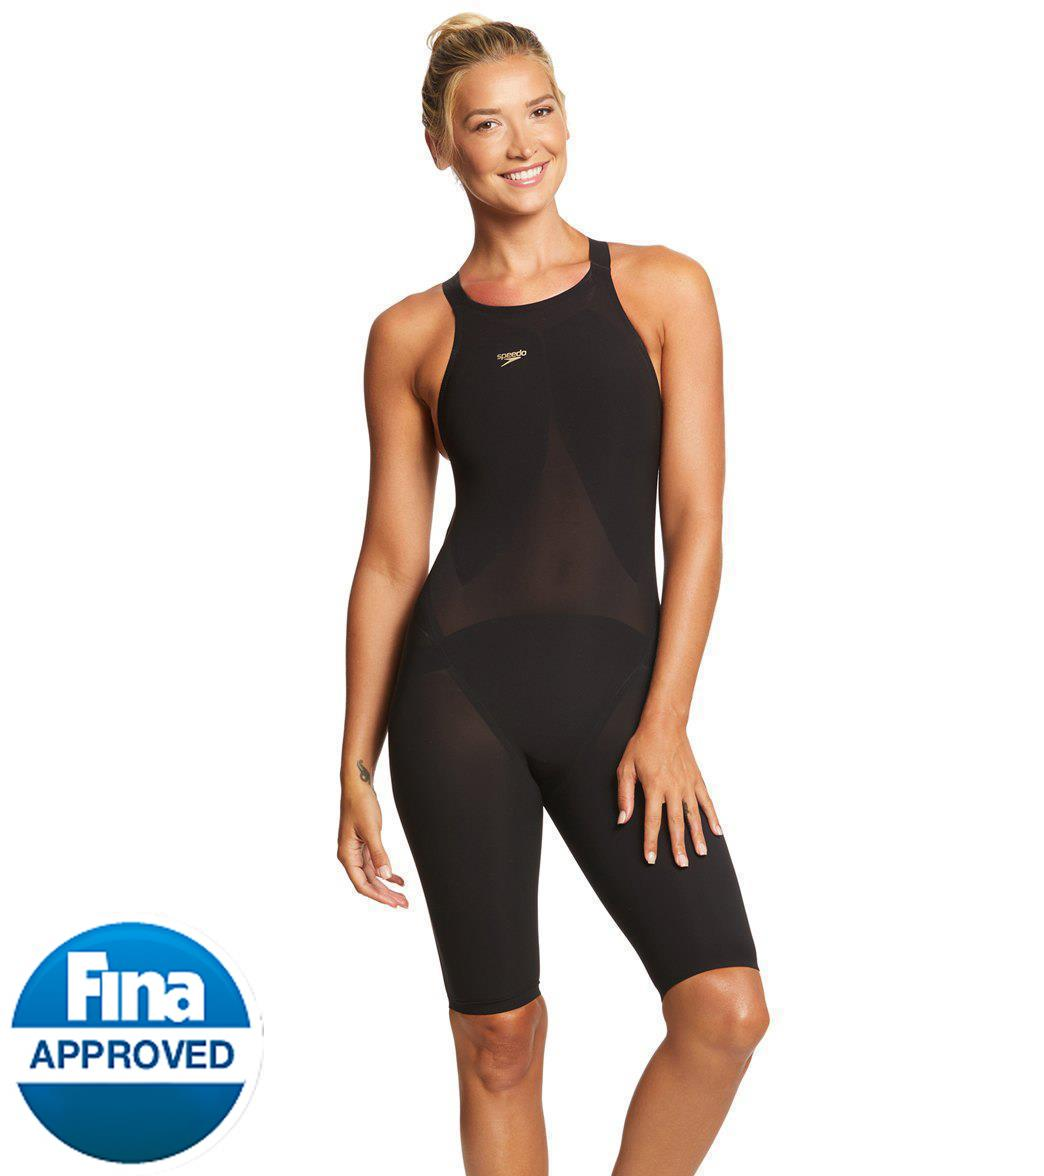 b612323eb9bf4 Speedo Women's LZR Racer Elite 2 Comfort Strap Kneeskin Tech Suit Swimsuit  at SwimOutlet.com - Free Shipping